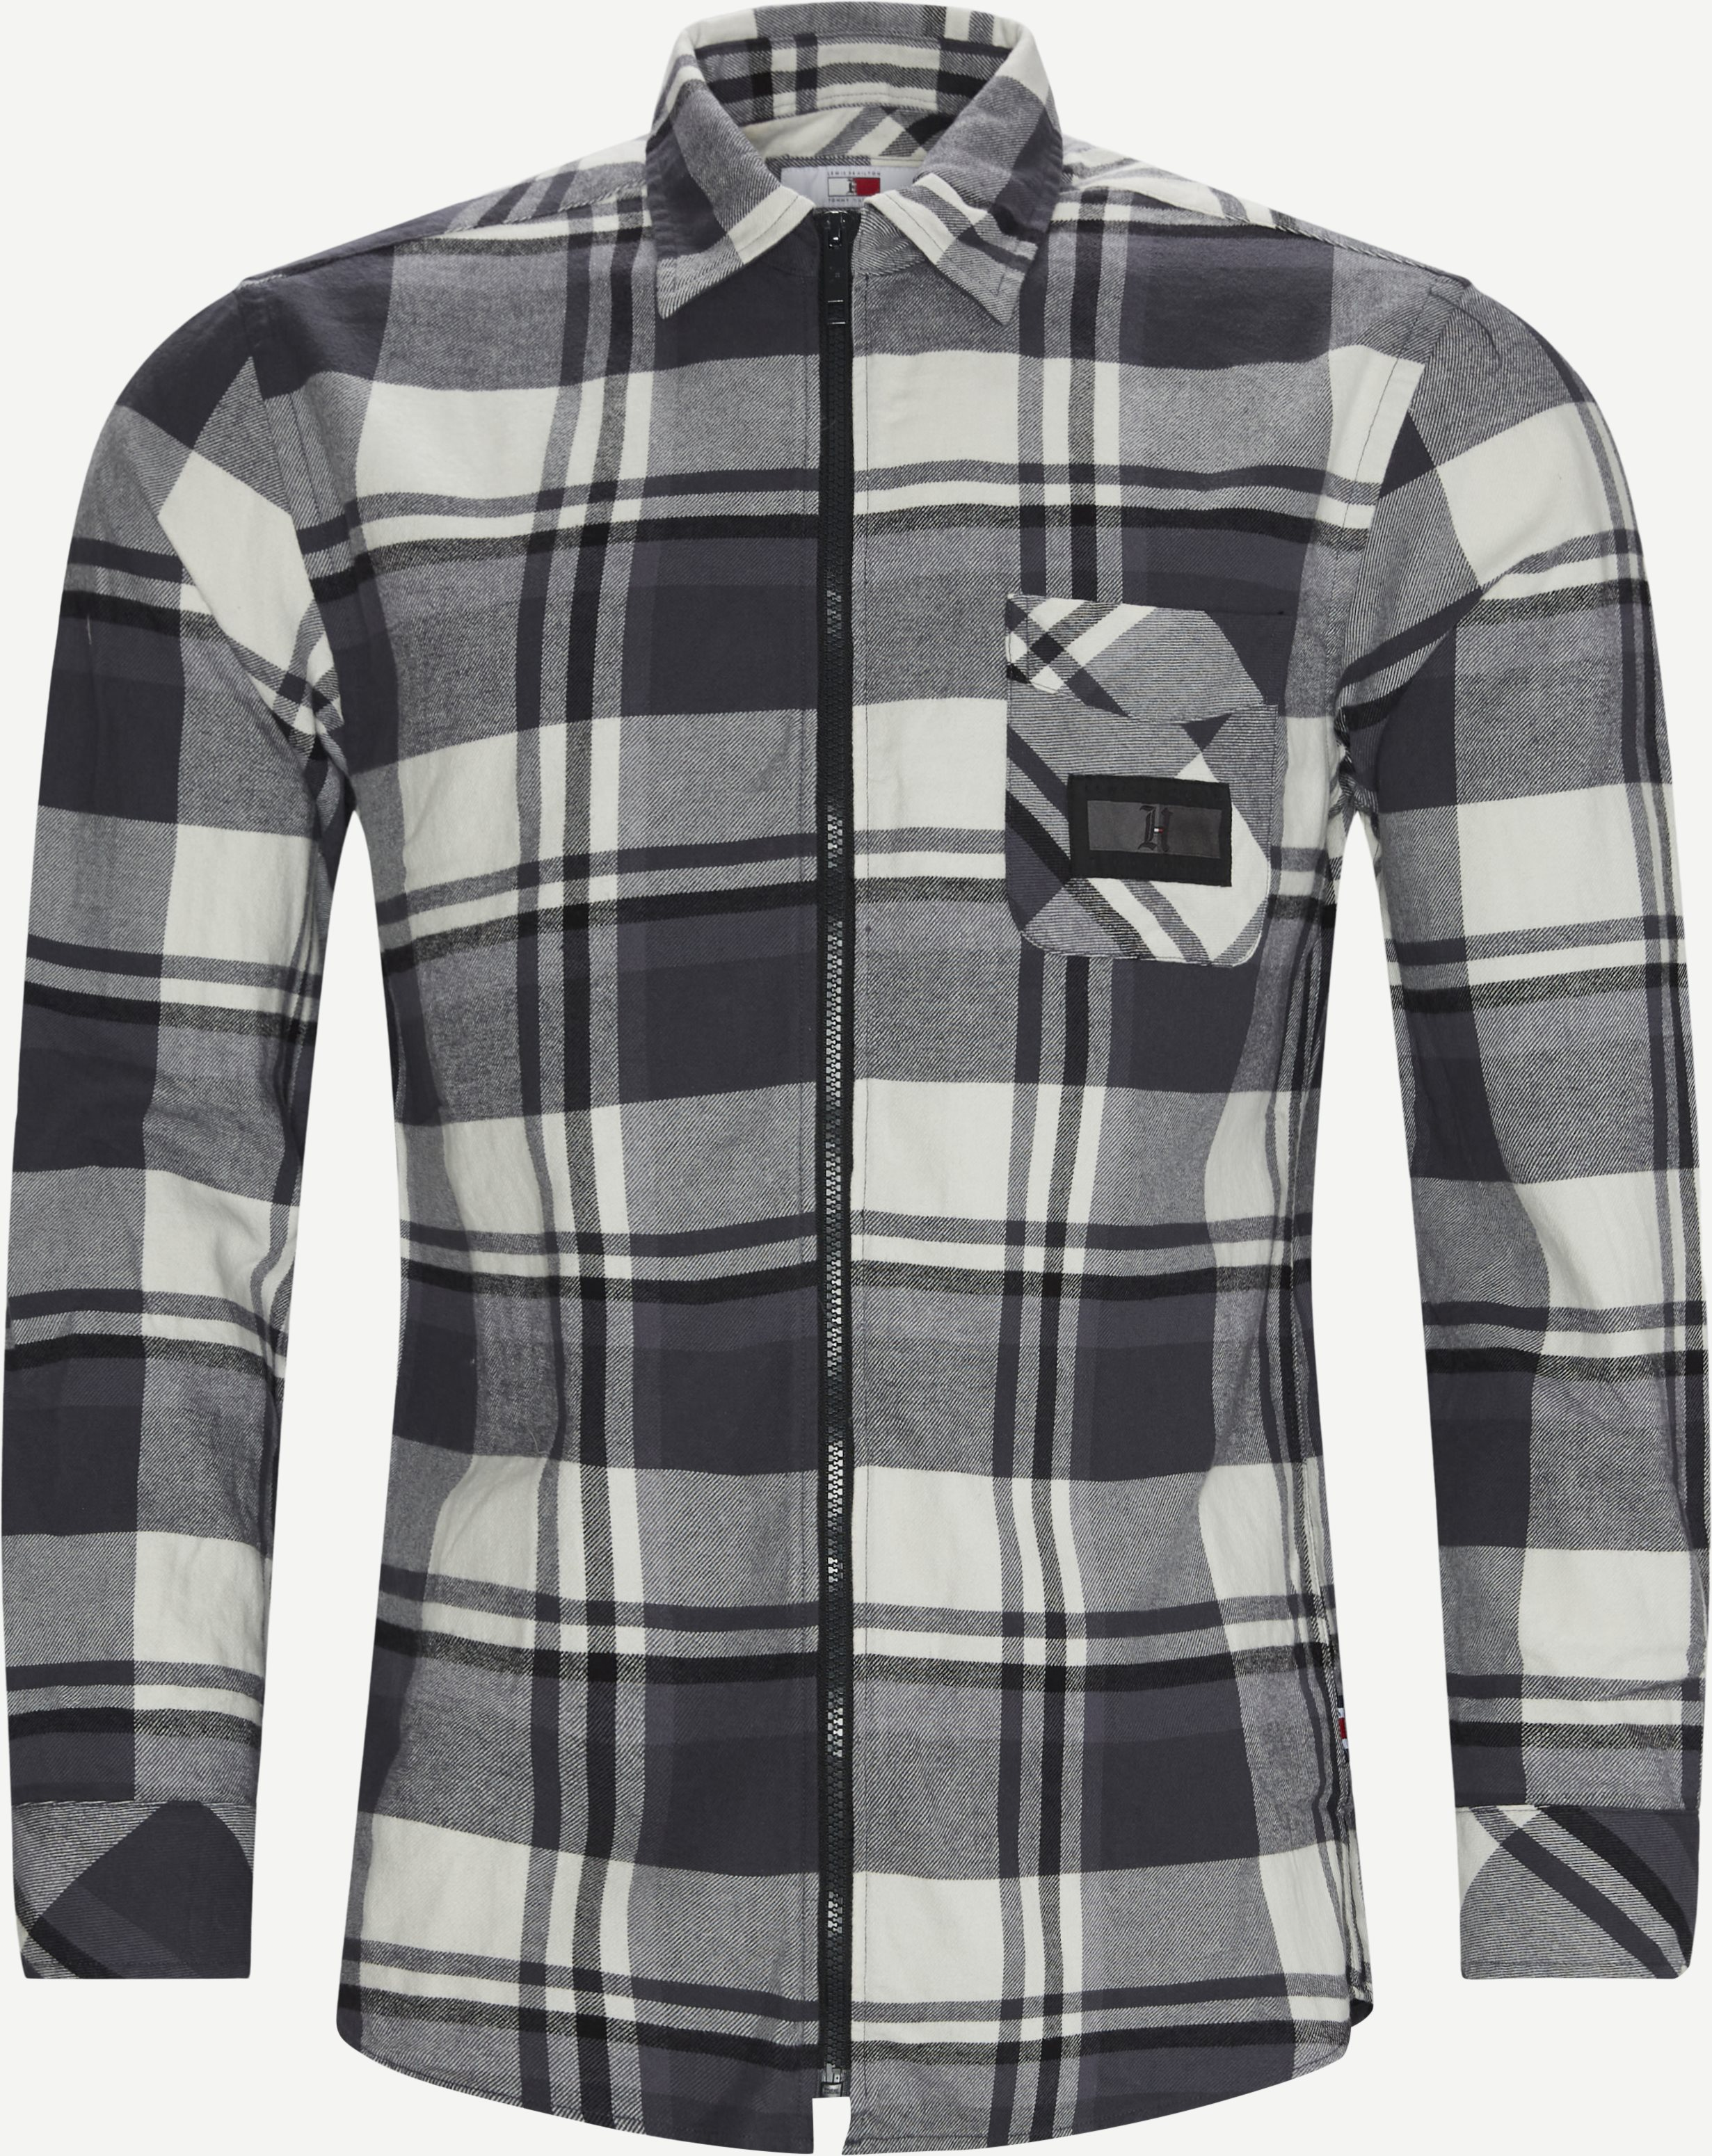 Skjortor - Oversize fit - Svart